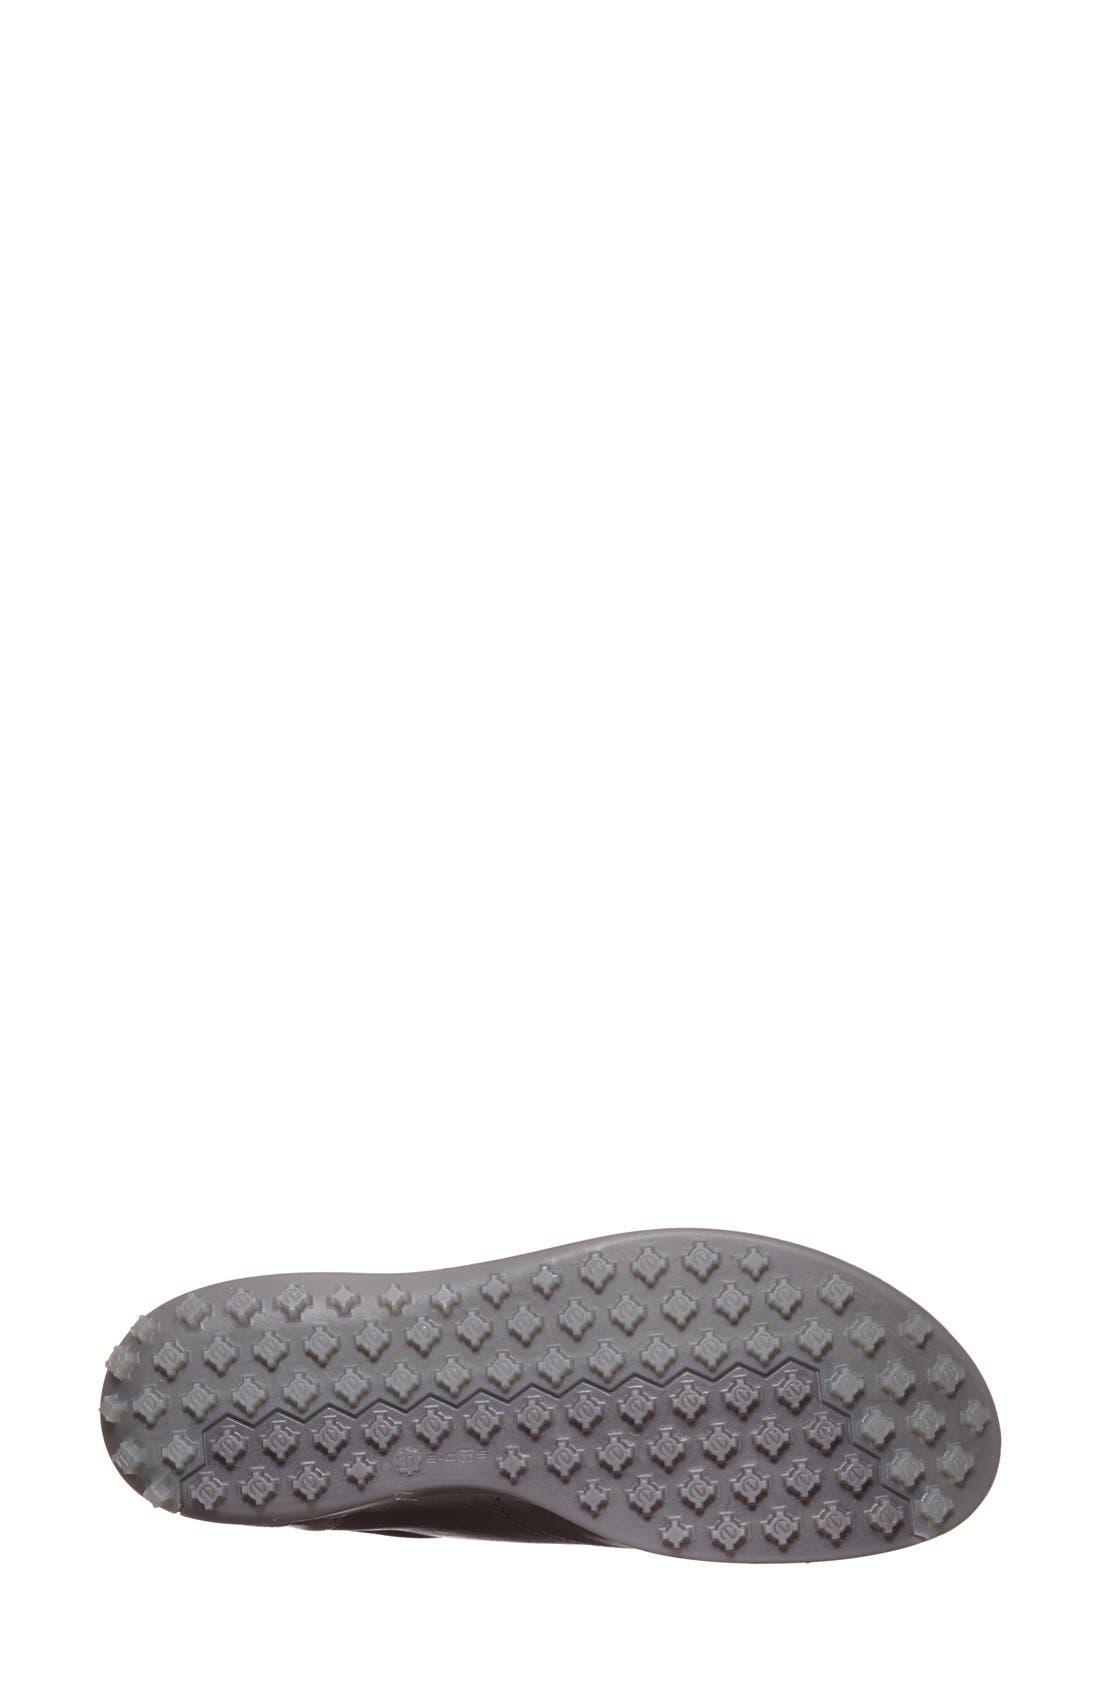 'BIOM' Hydromax<sup>®</sup> Waterproof Golf Shoe,                             Alternate thumbnail 2, color,                             007